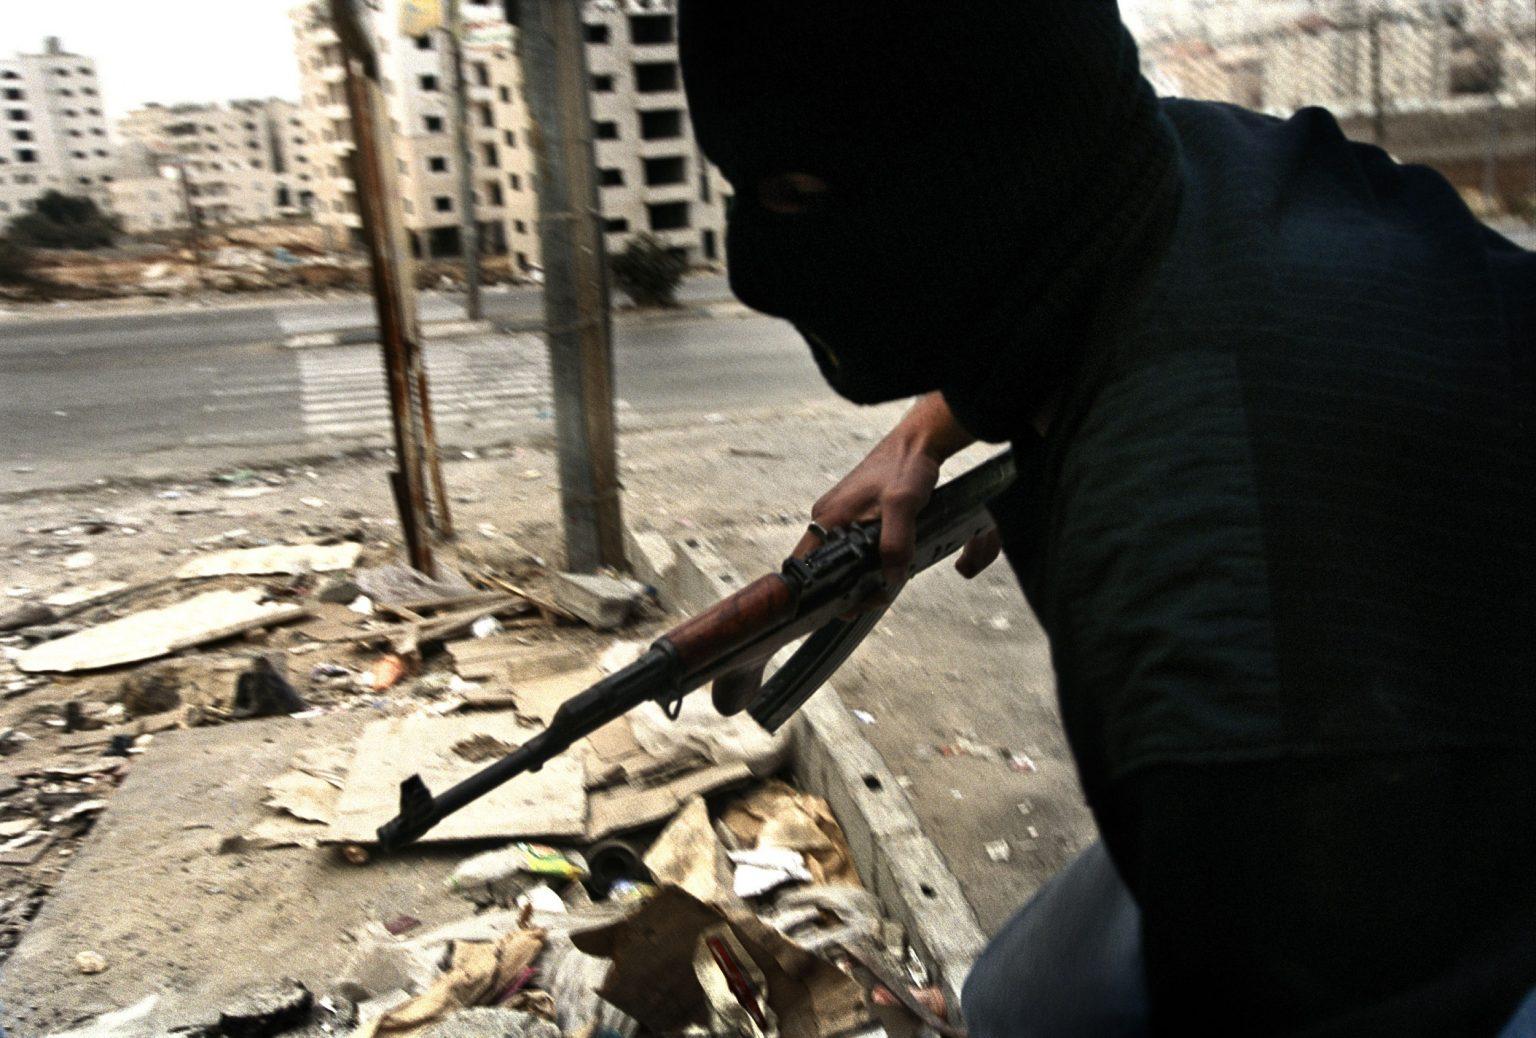 intifada-ramallah-west-bank-2000intifada-ramallah-cisgiordania-2000-3